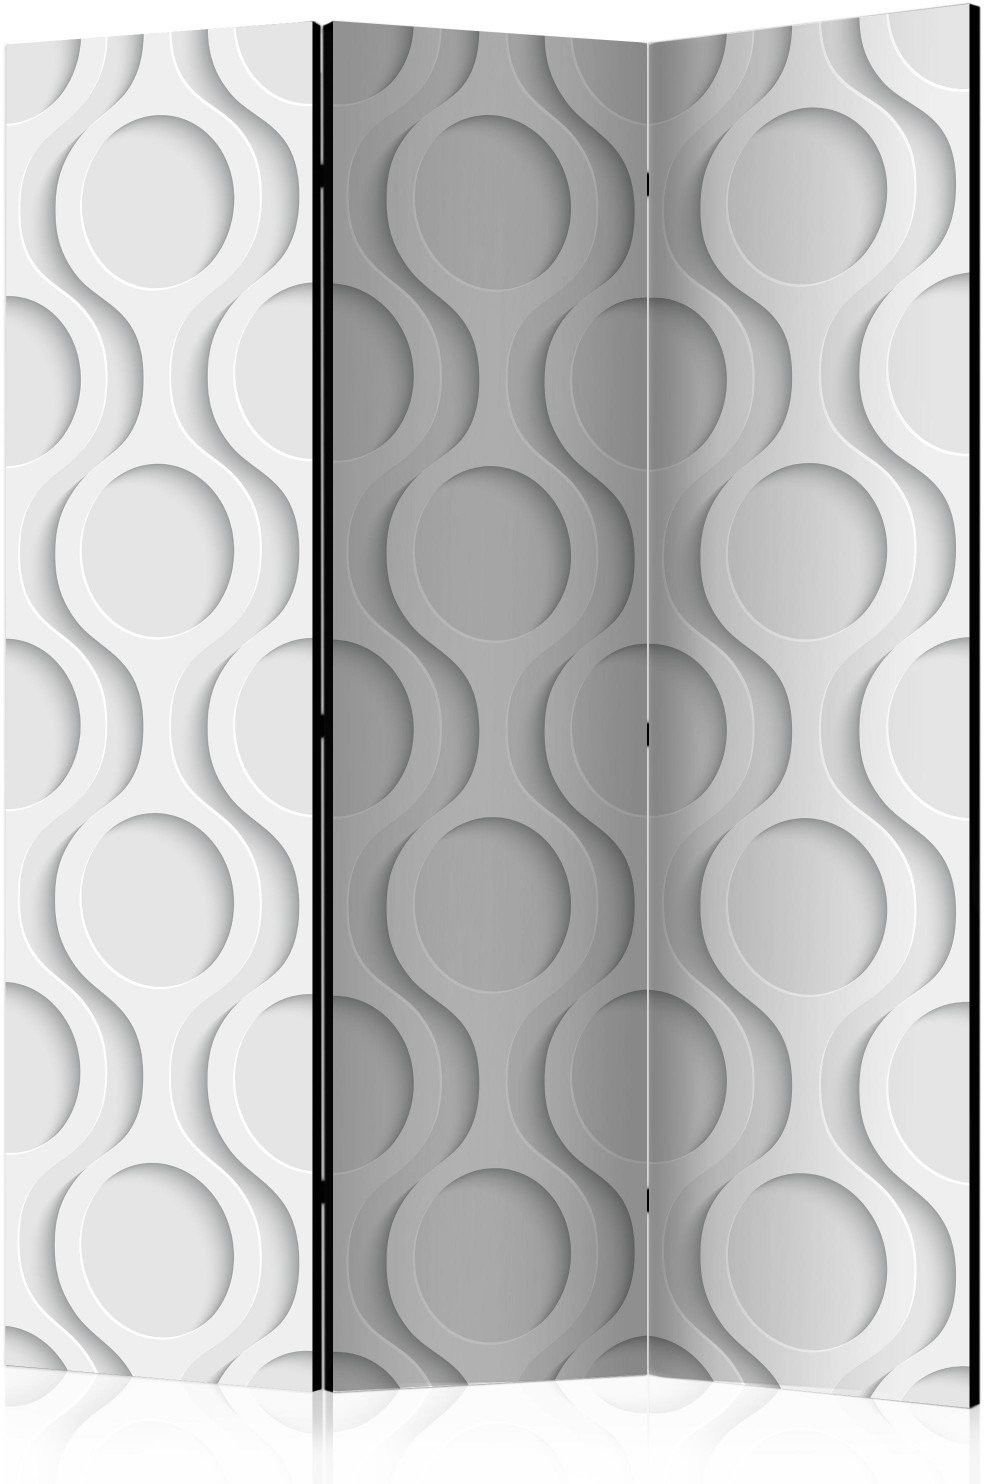 Parawan 3-częściowy - łańcuchy [room dividers]